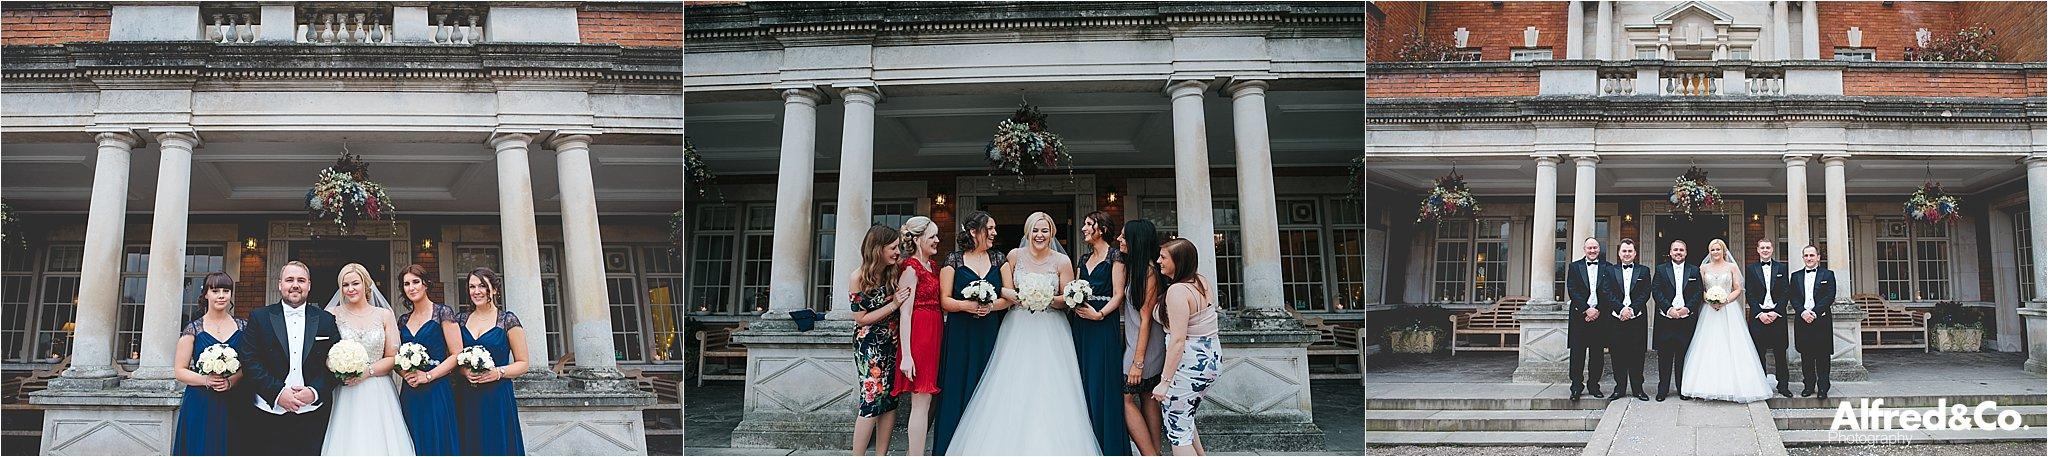 Clitheroe Wedding Photographer